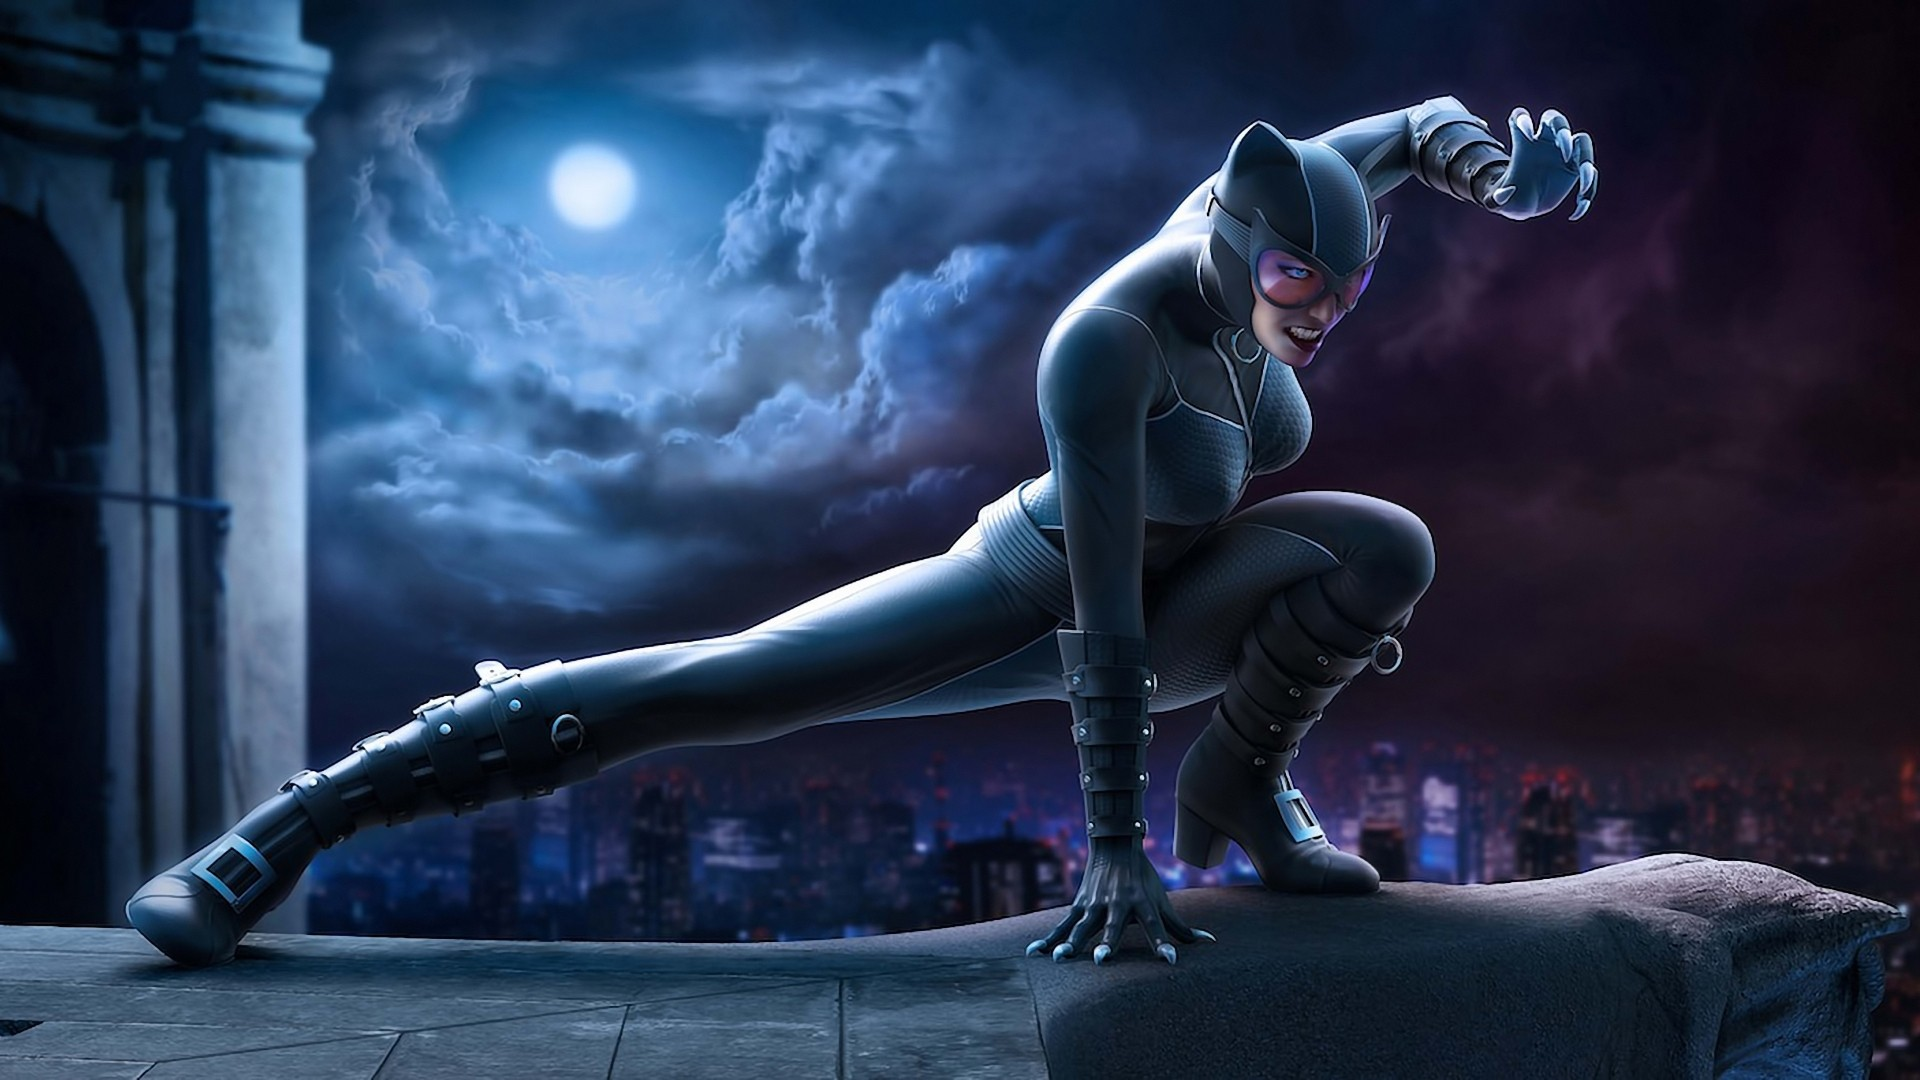 Catwoman Wallpaper Desktop